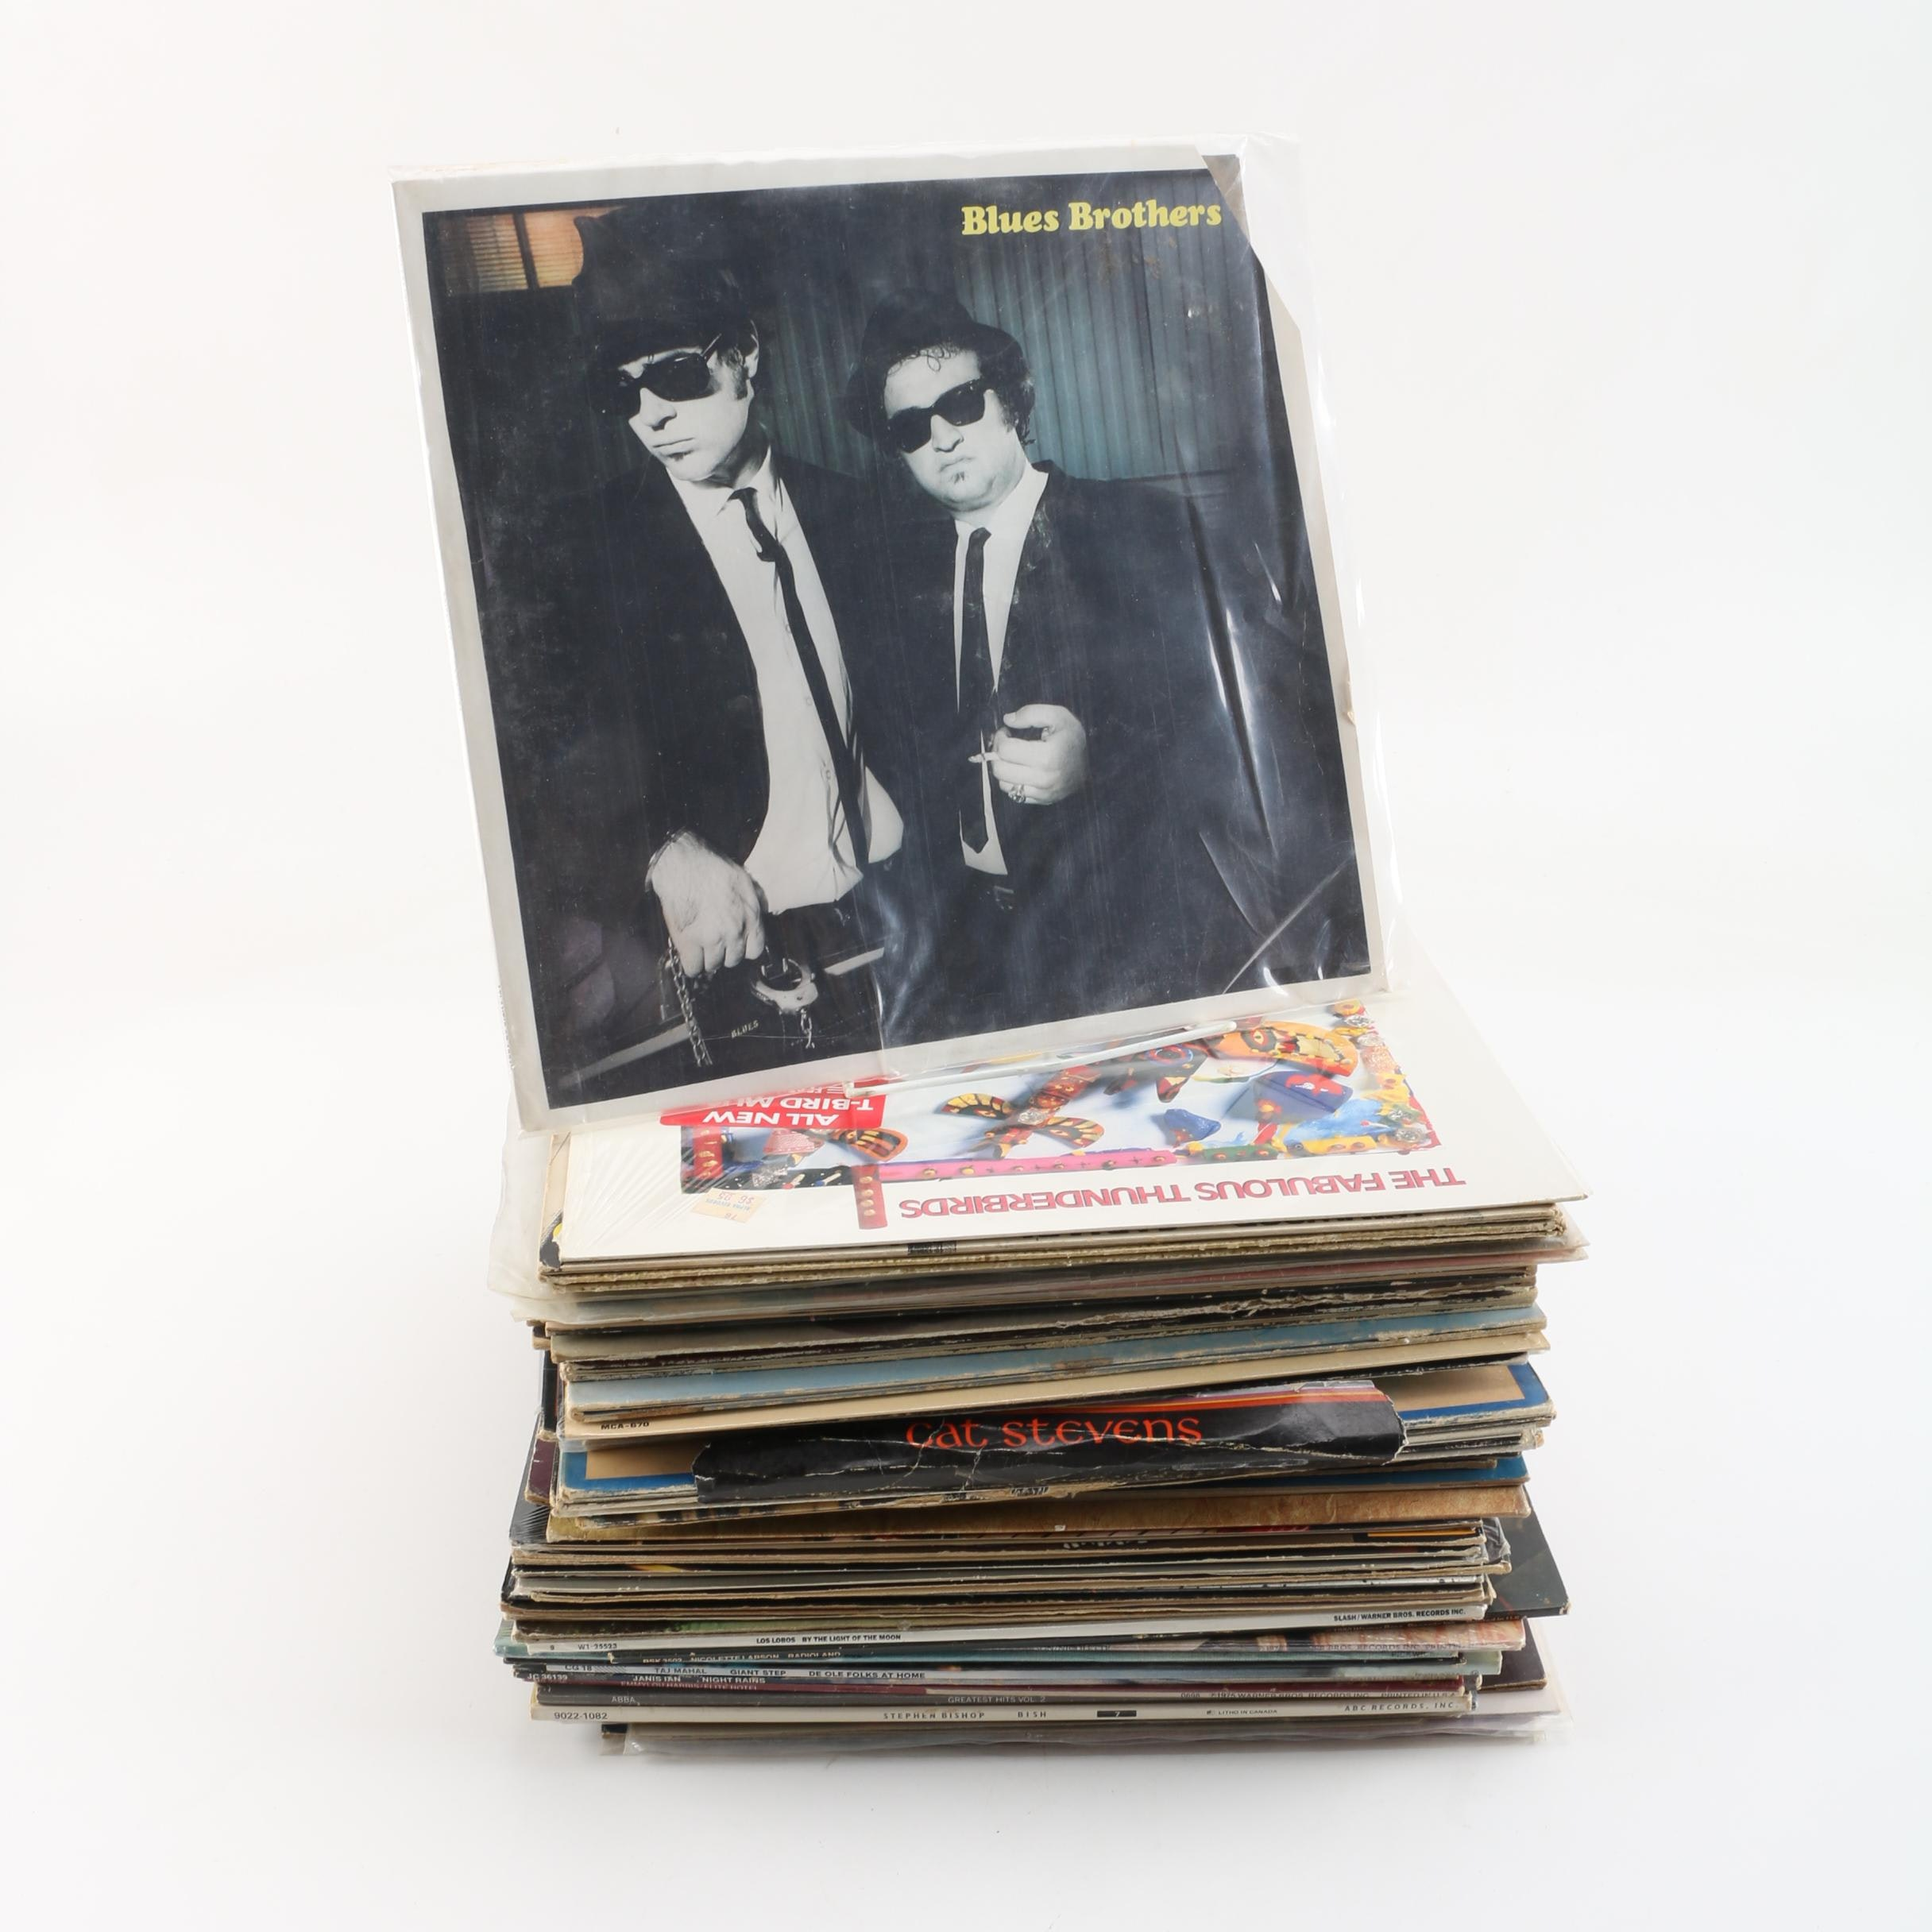 Pop and Rock Records Including Janis Joplin, Tom Petty, Traffic, Kenny Loggins